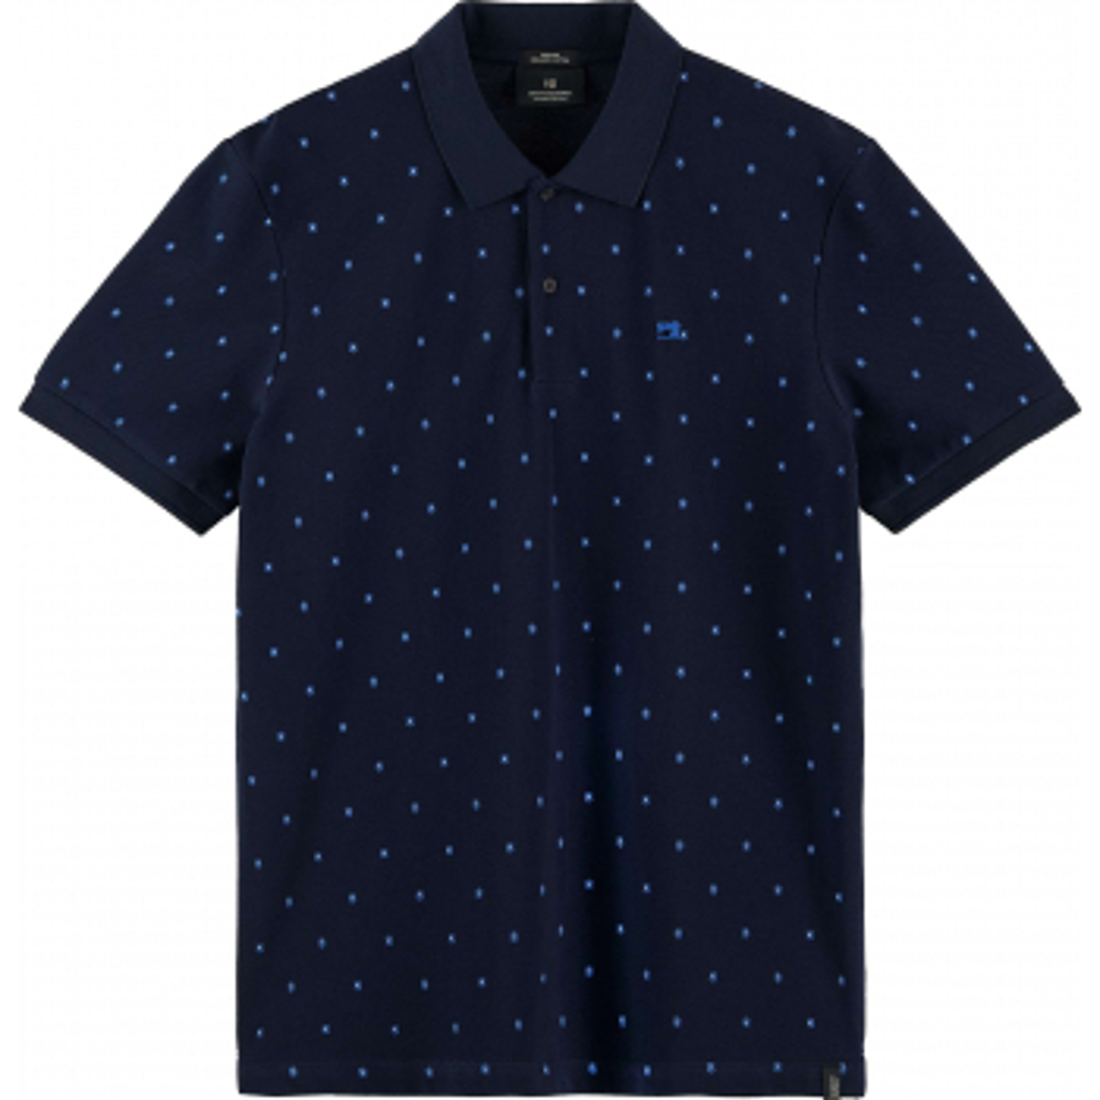 Classic all-over printed organic cotton dark blue